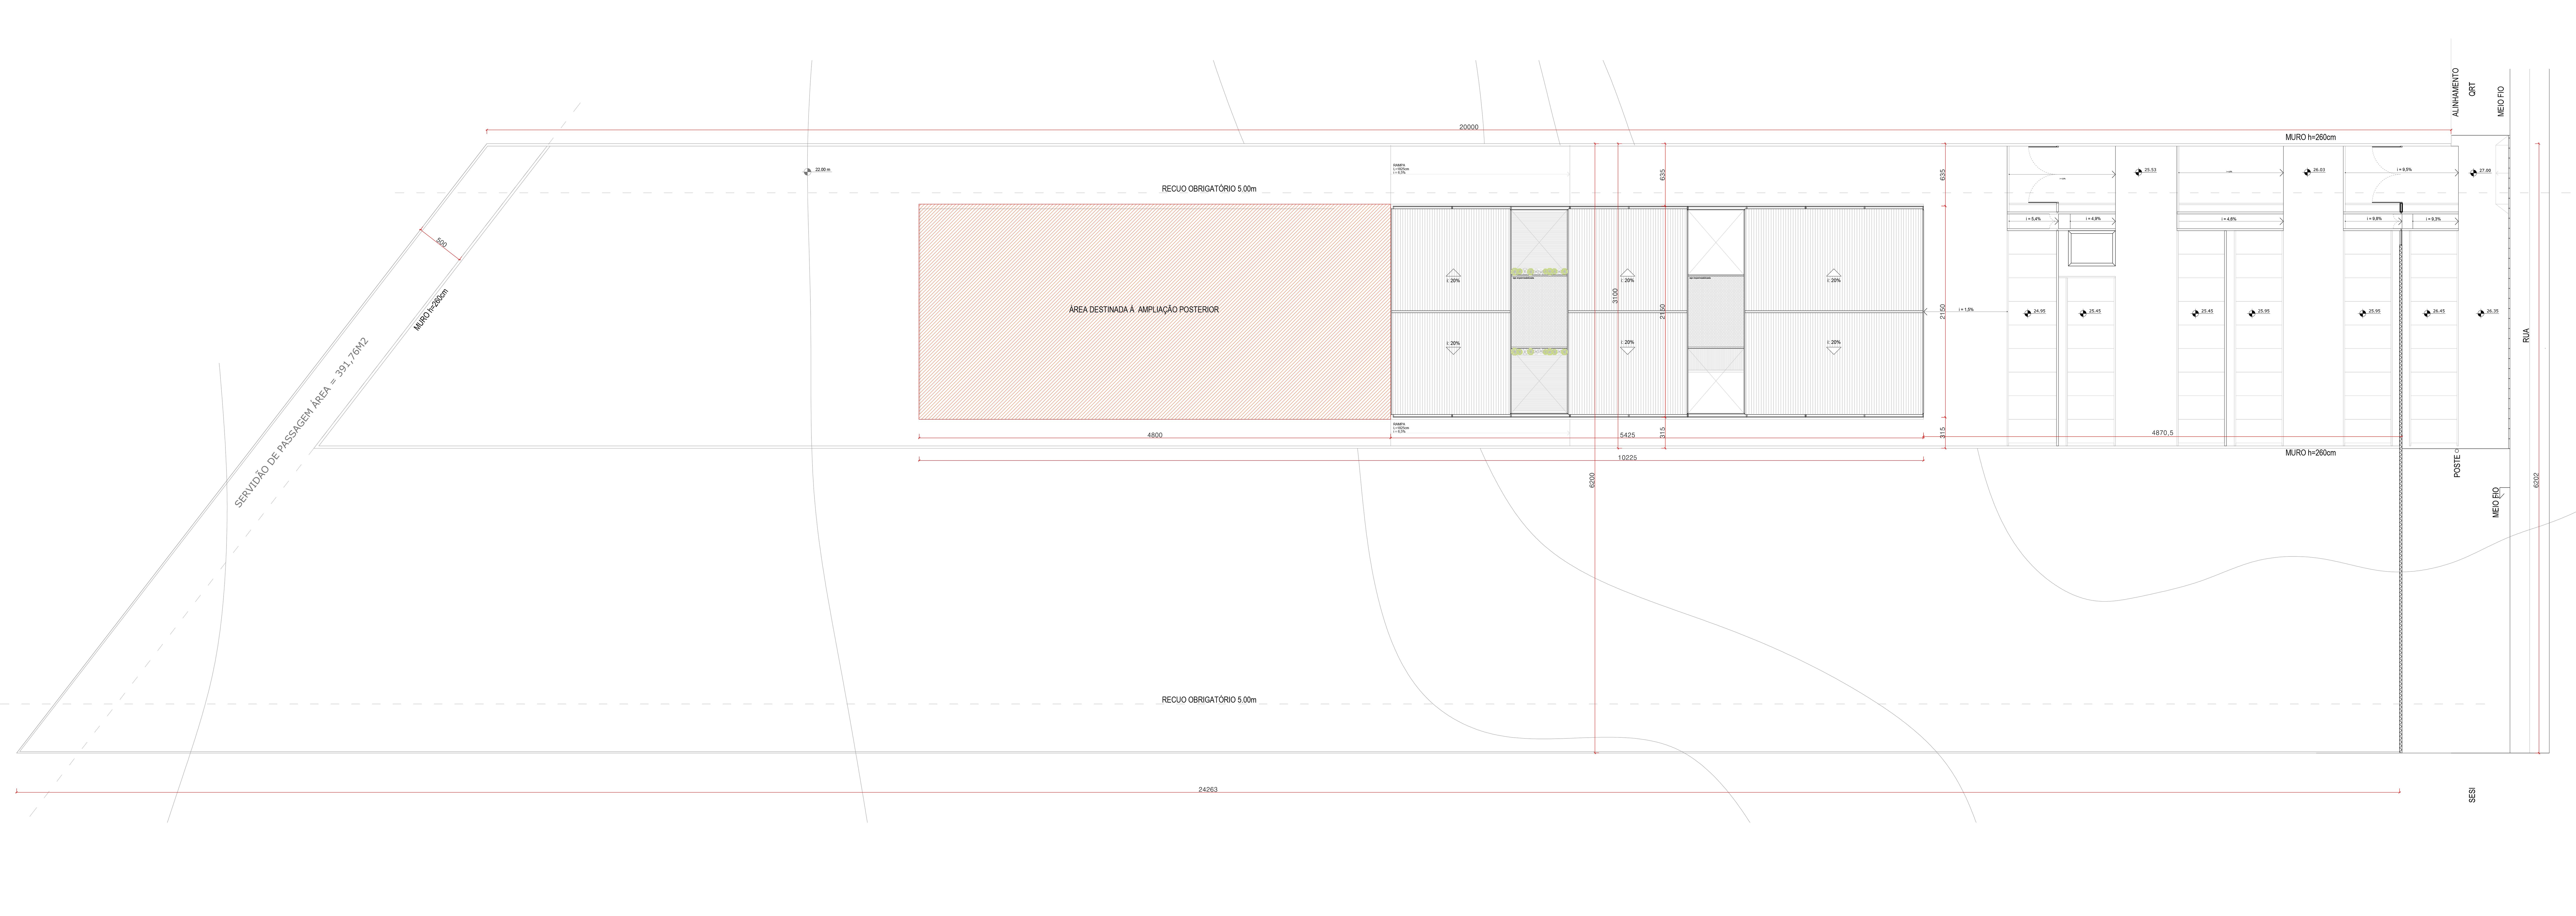 Engemold Headquarters - Floor plans